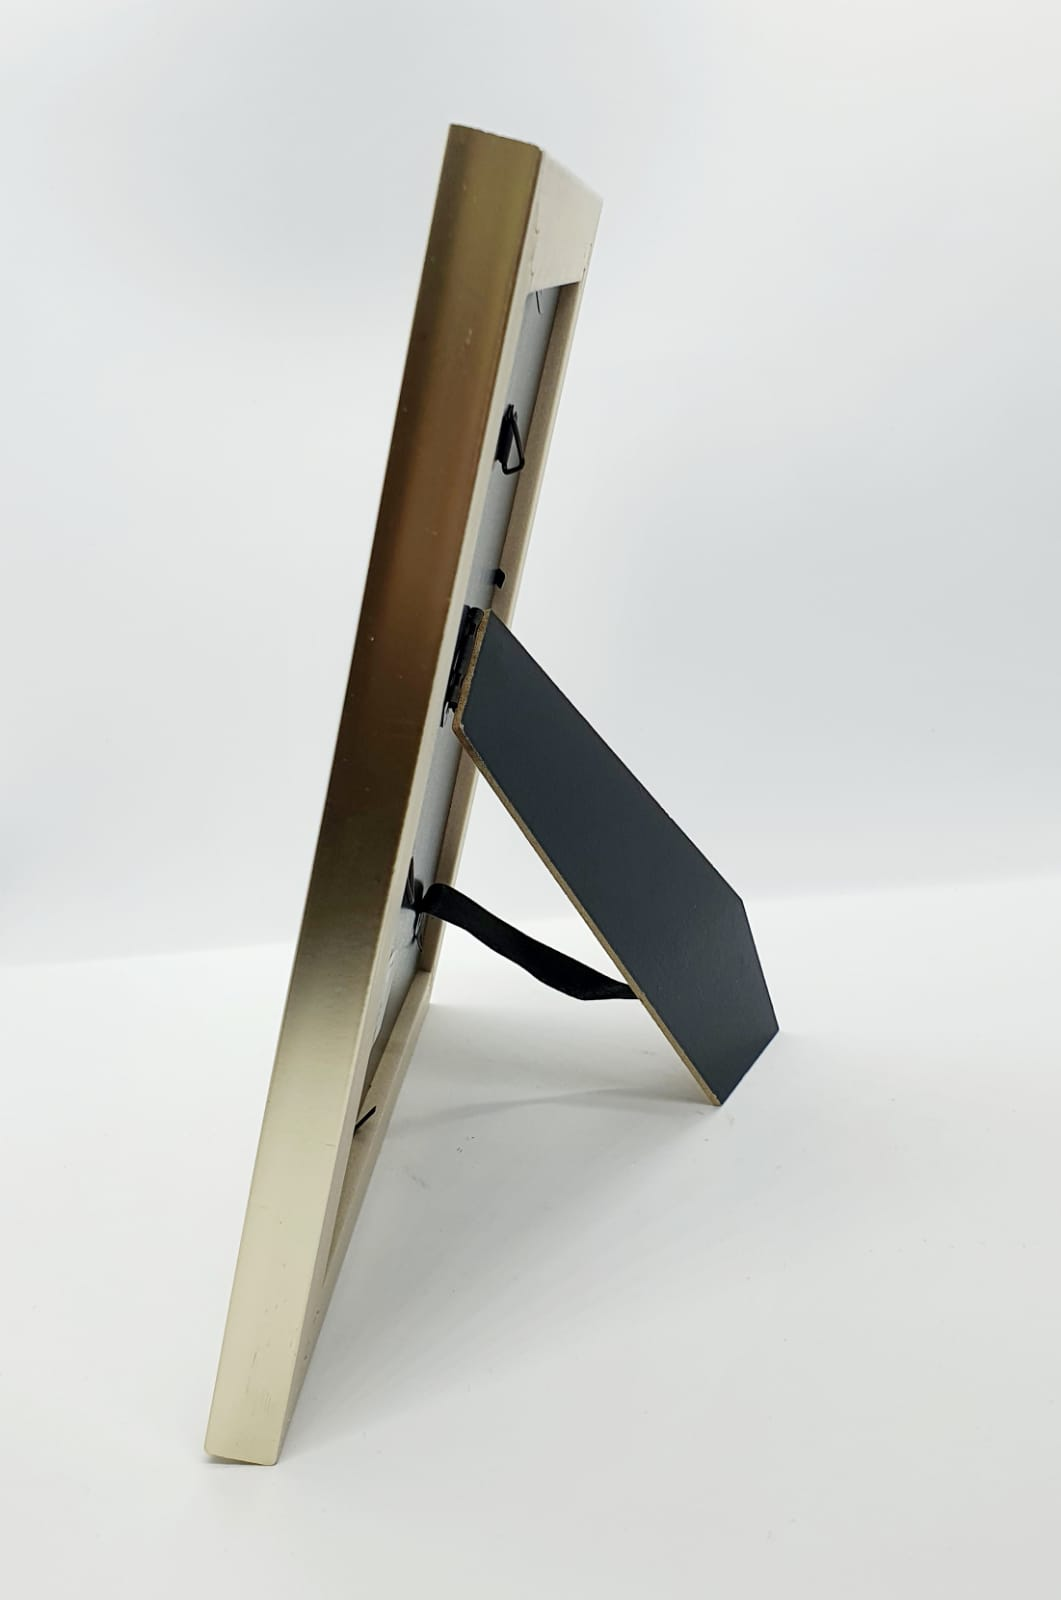 Porta retrato marmorizado perolado Mart - Foto 15x20cm